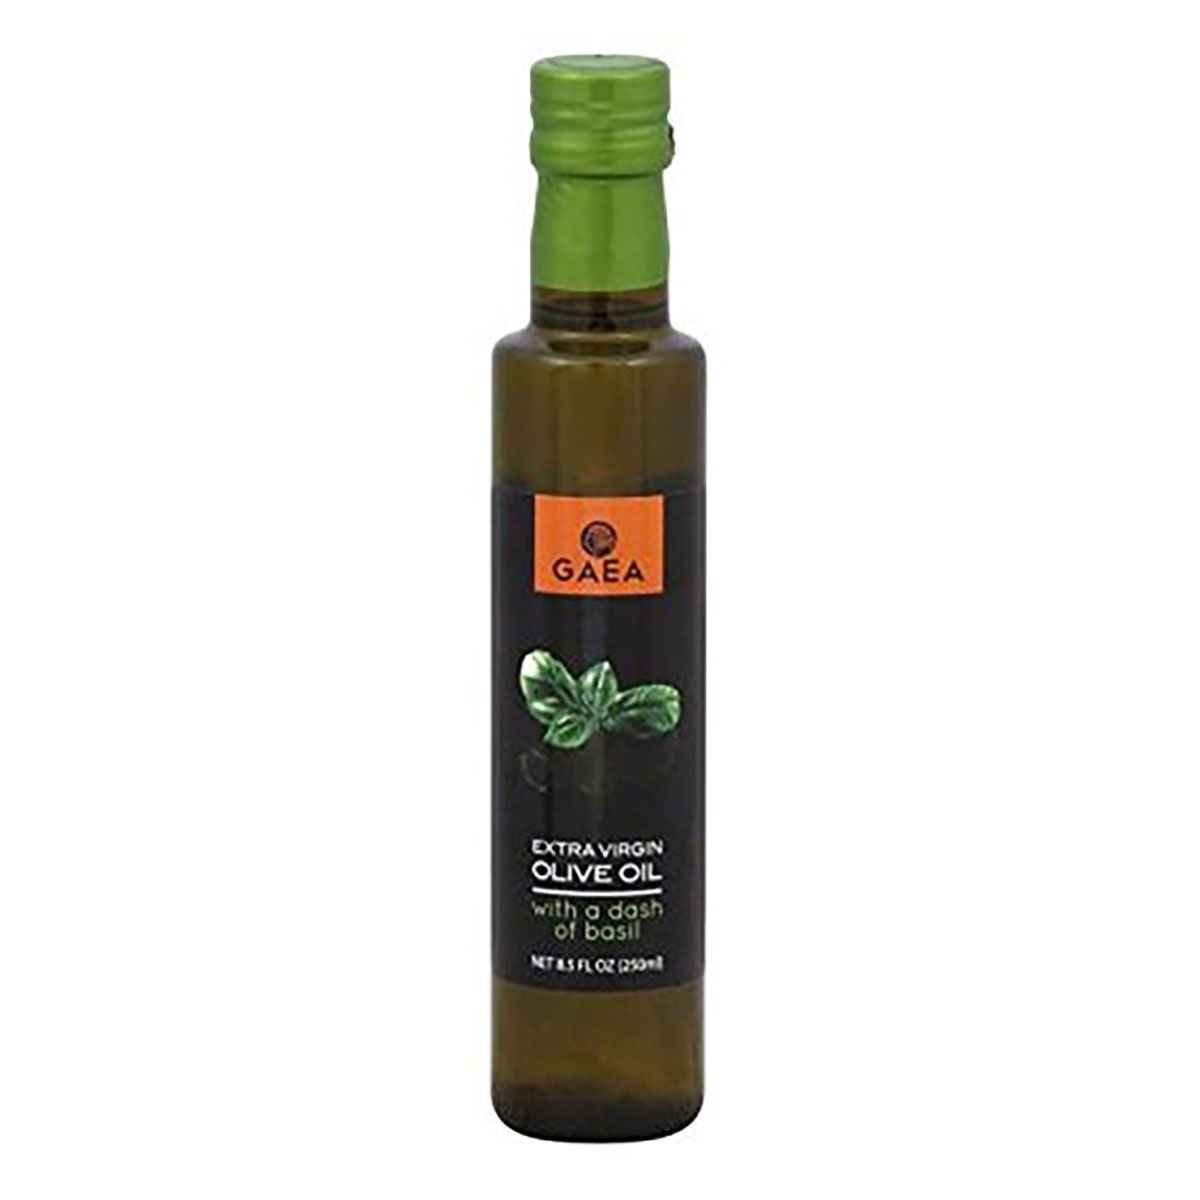 GAEA Extra Virgin Olive Oil; Basil , Pack of 8